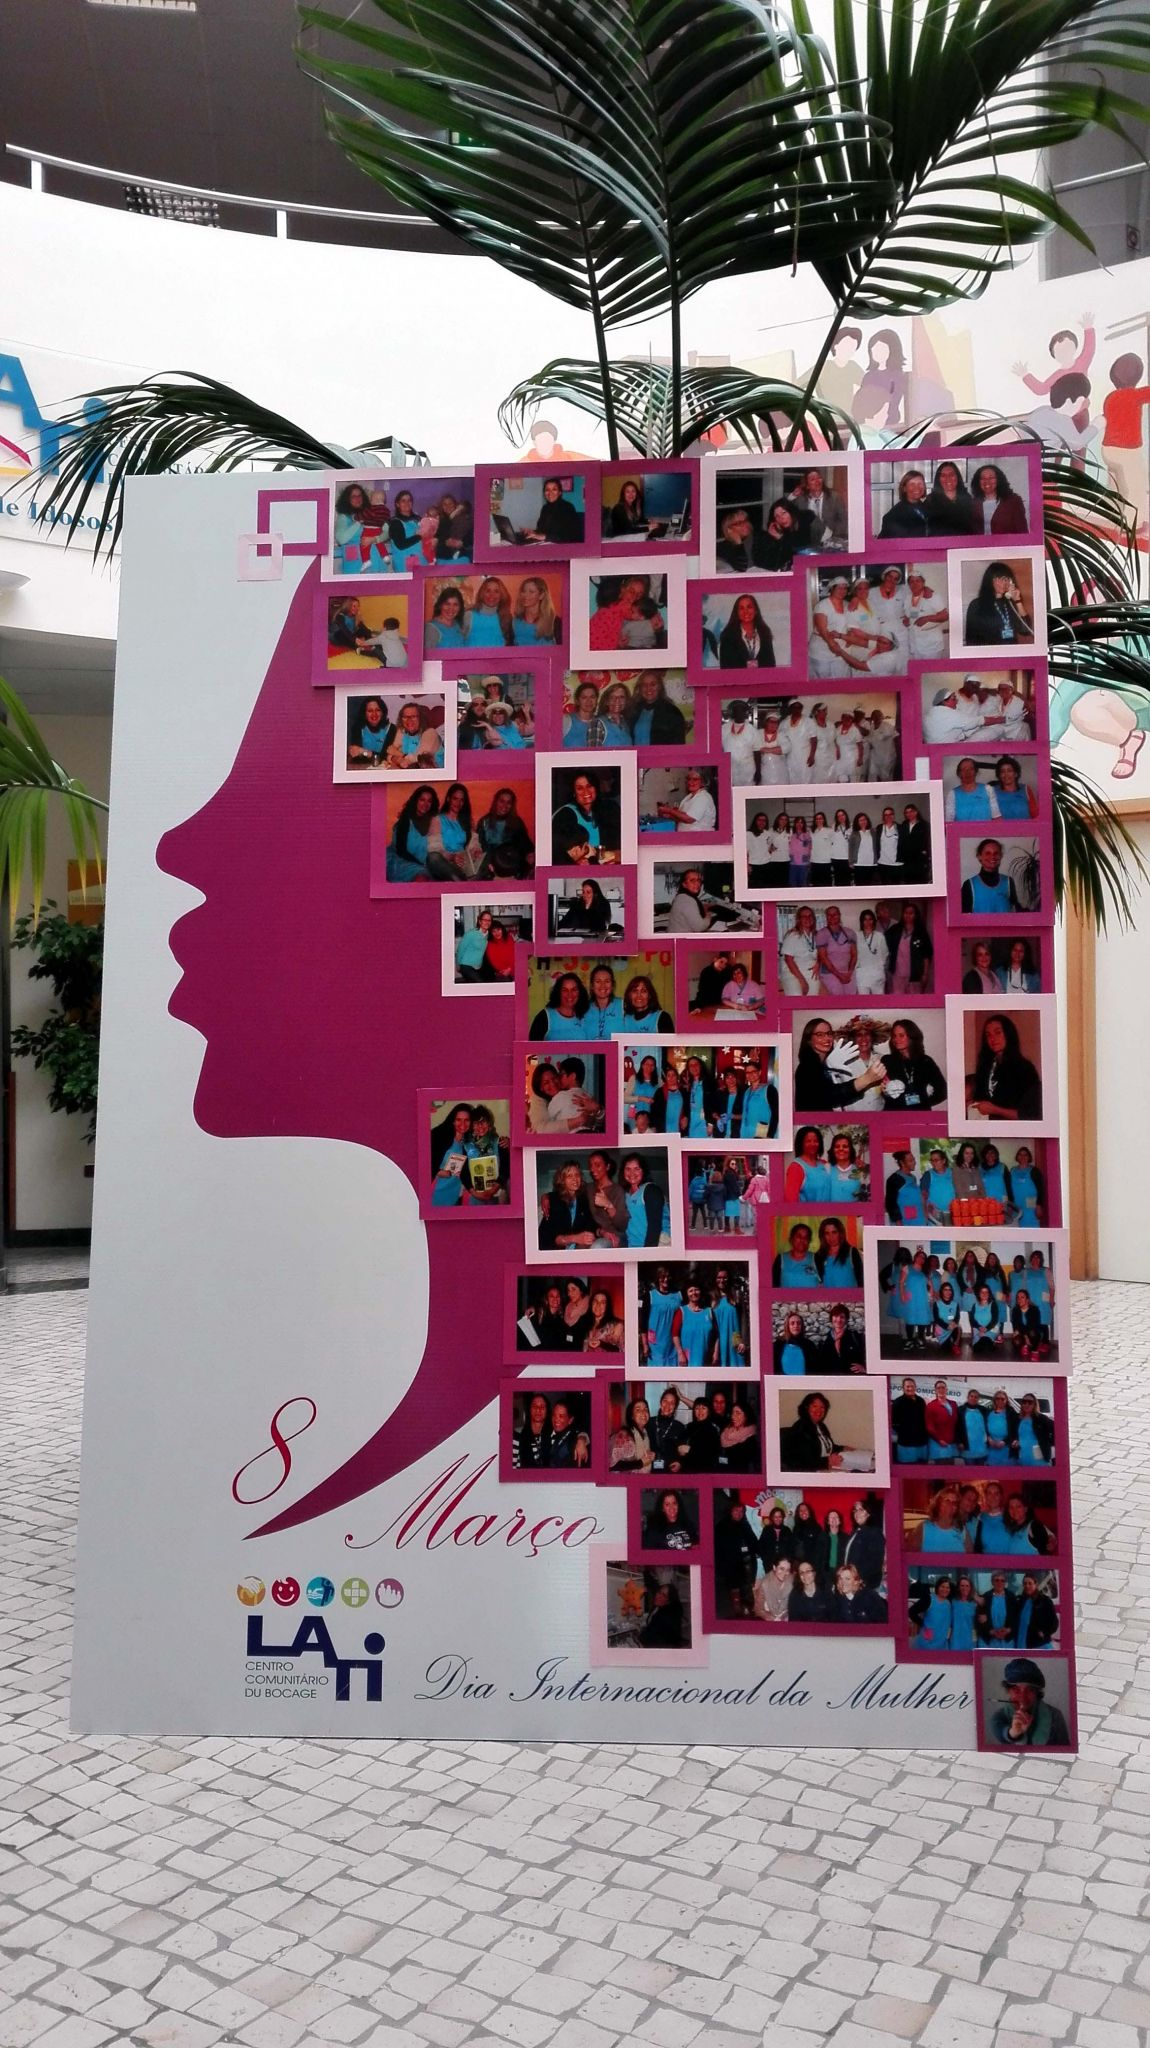 LATI comemora Dia Internacional da Mulher